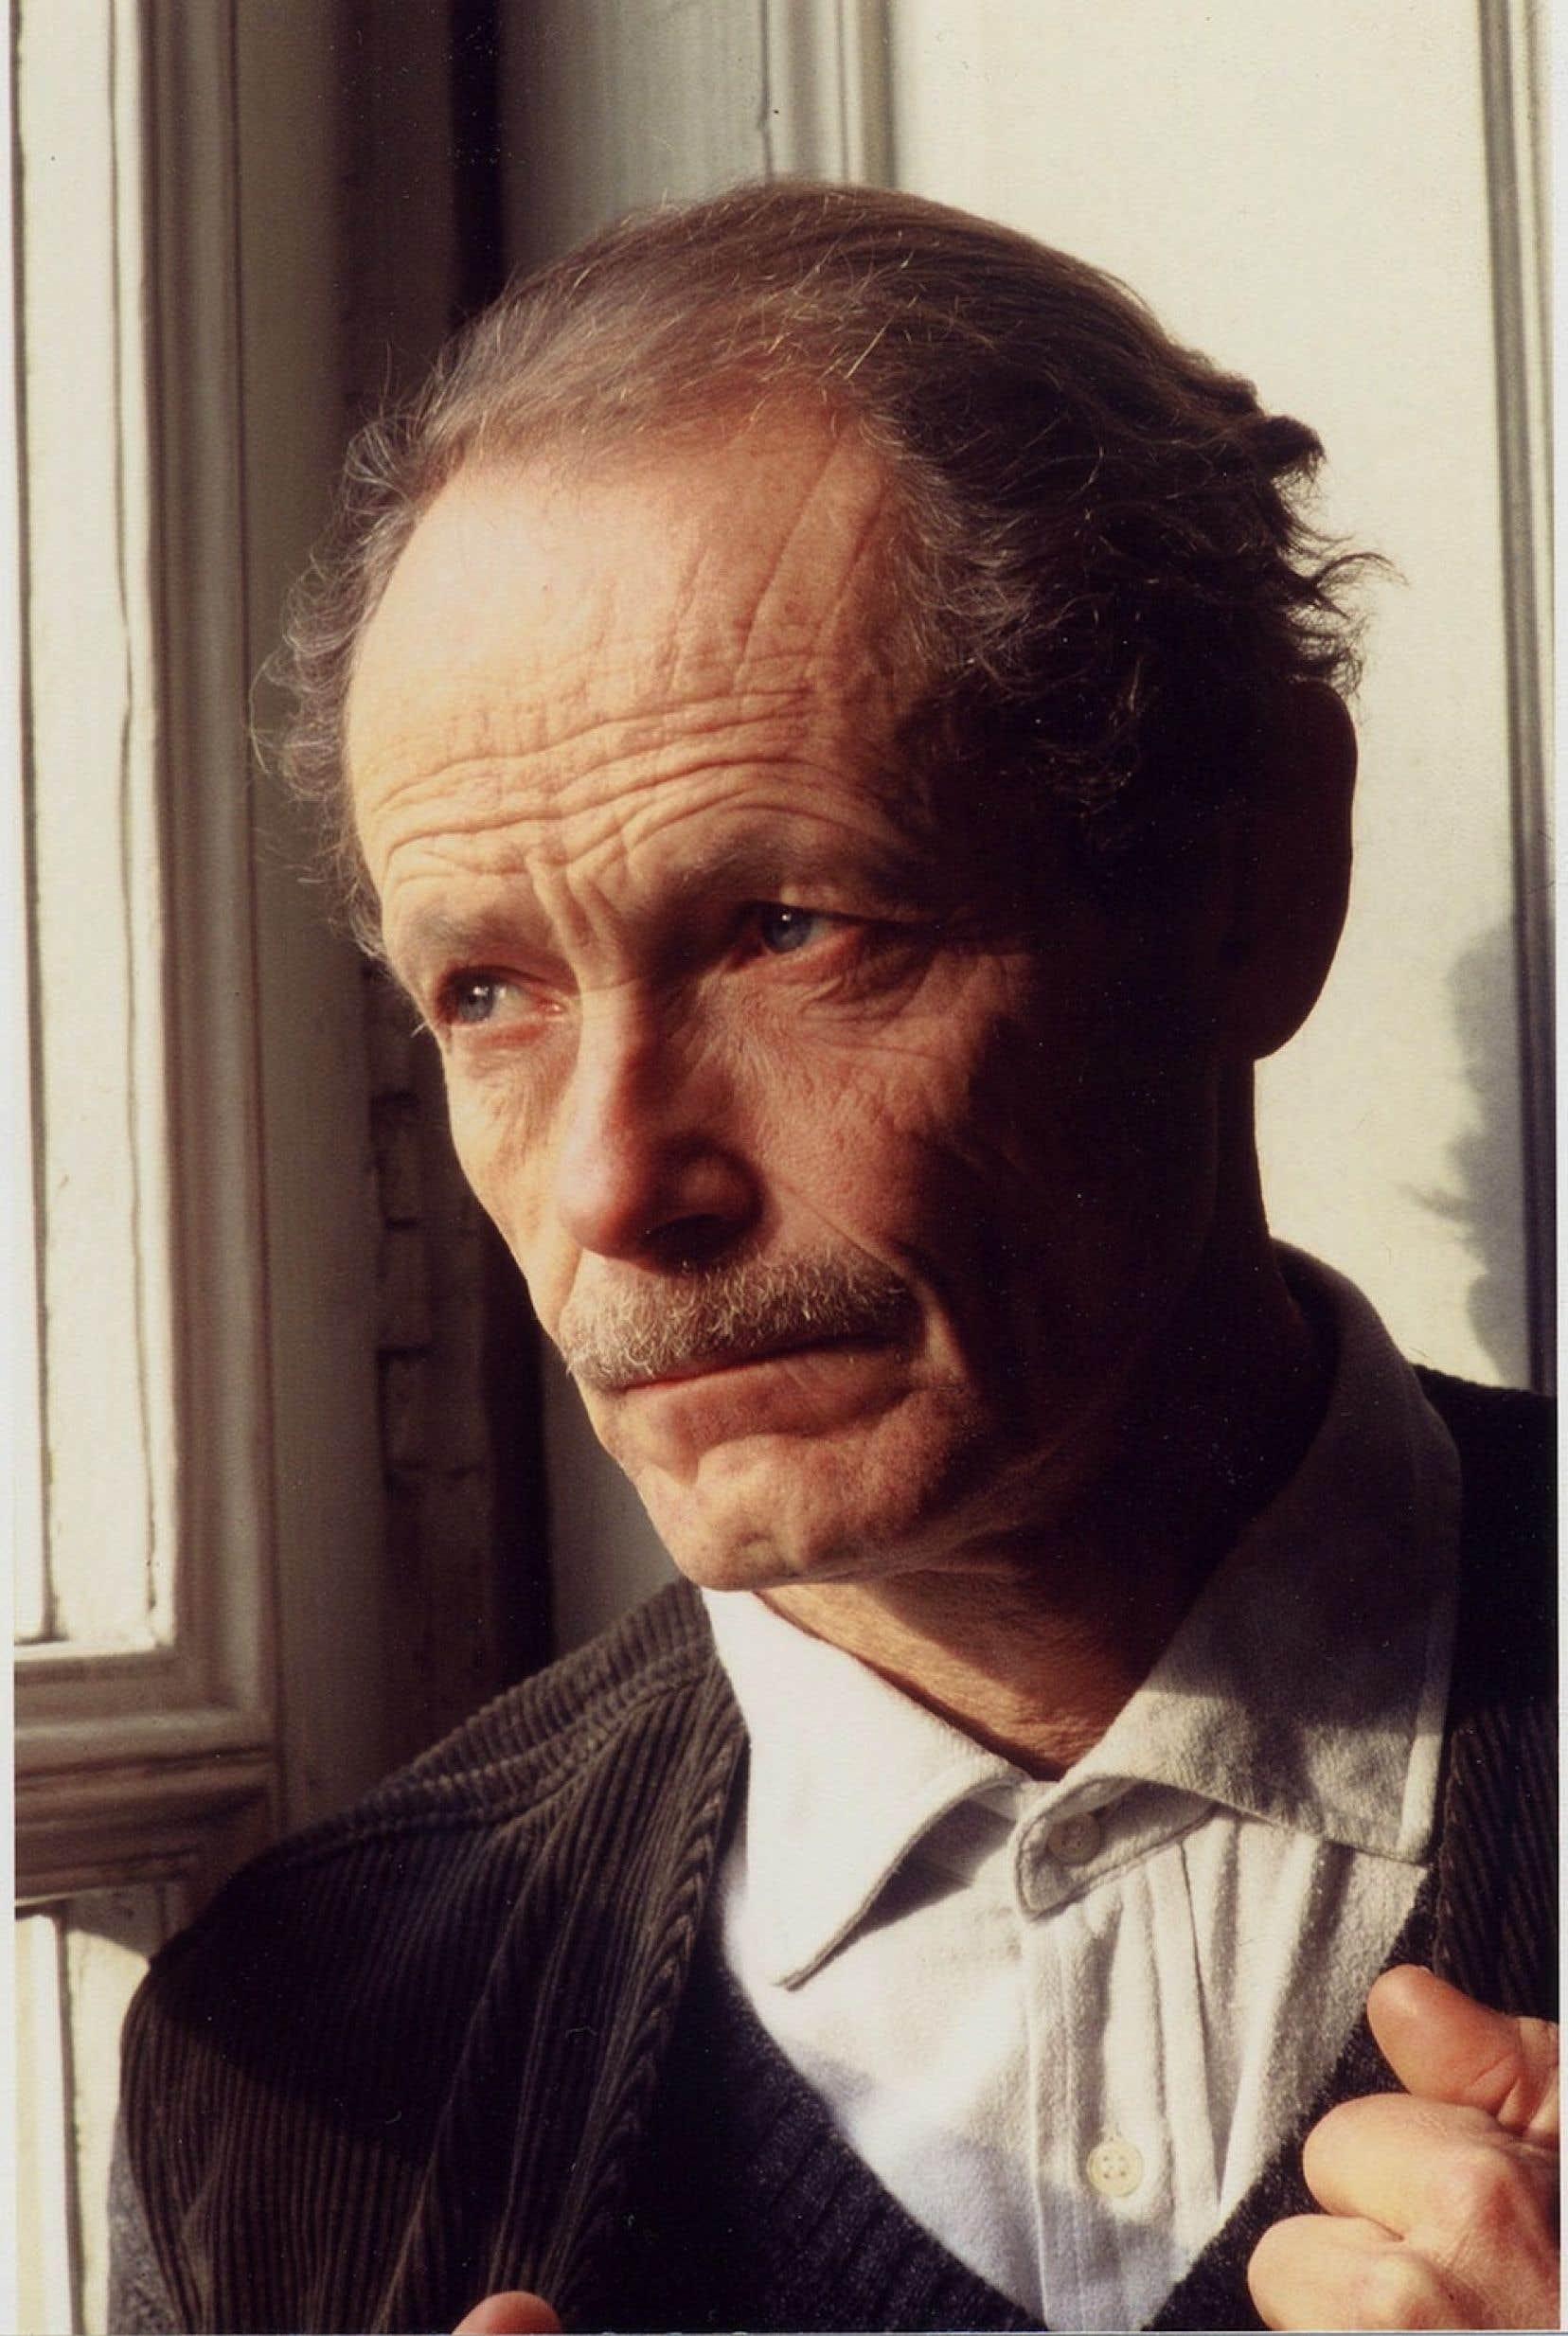 L'écrivain italien Erri De Luca